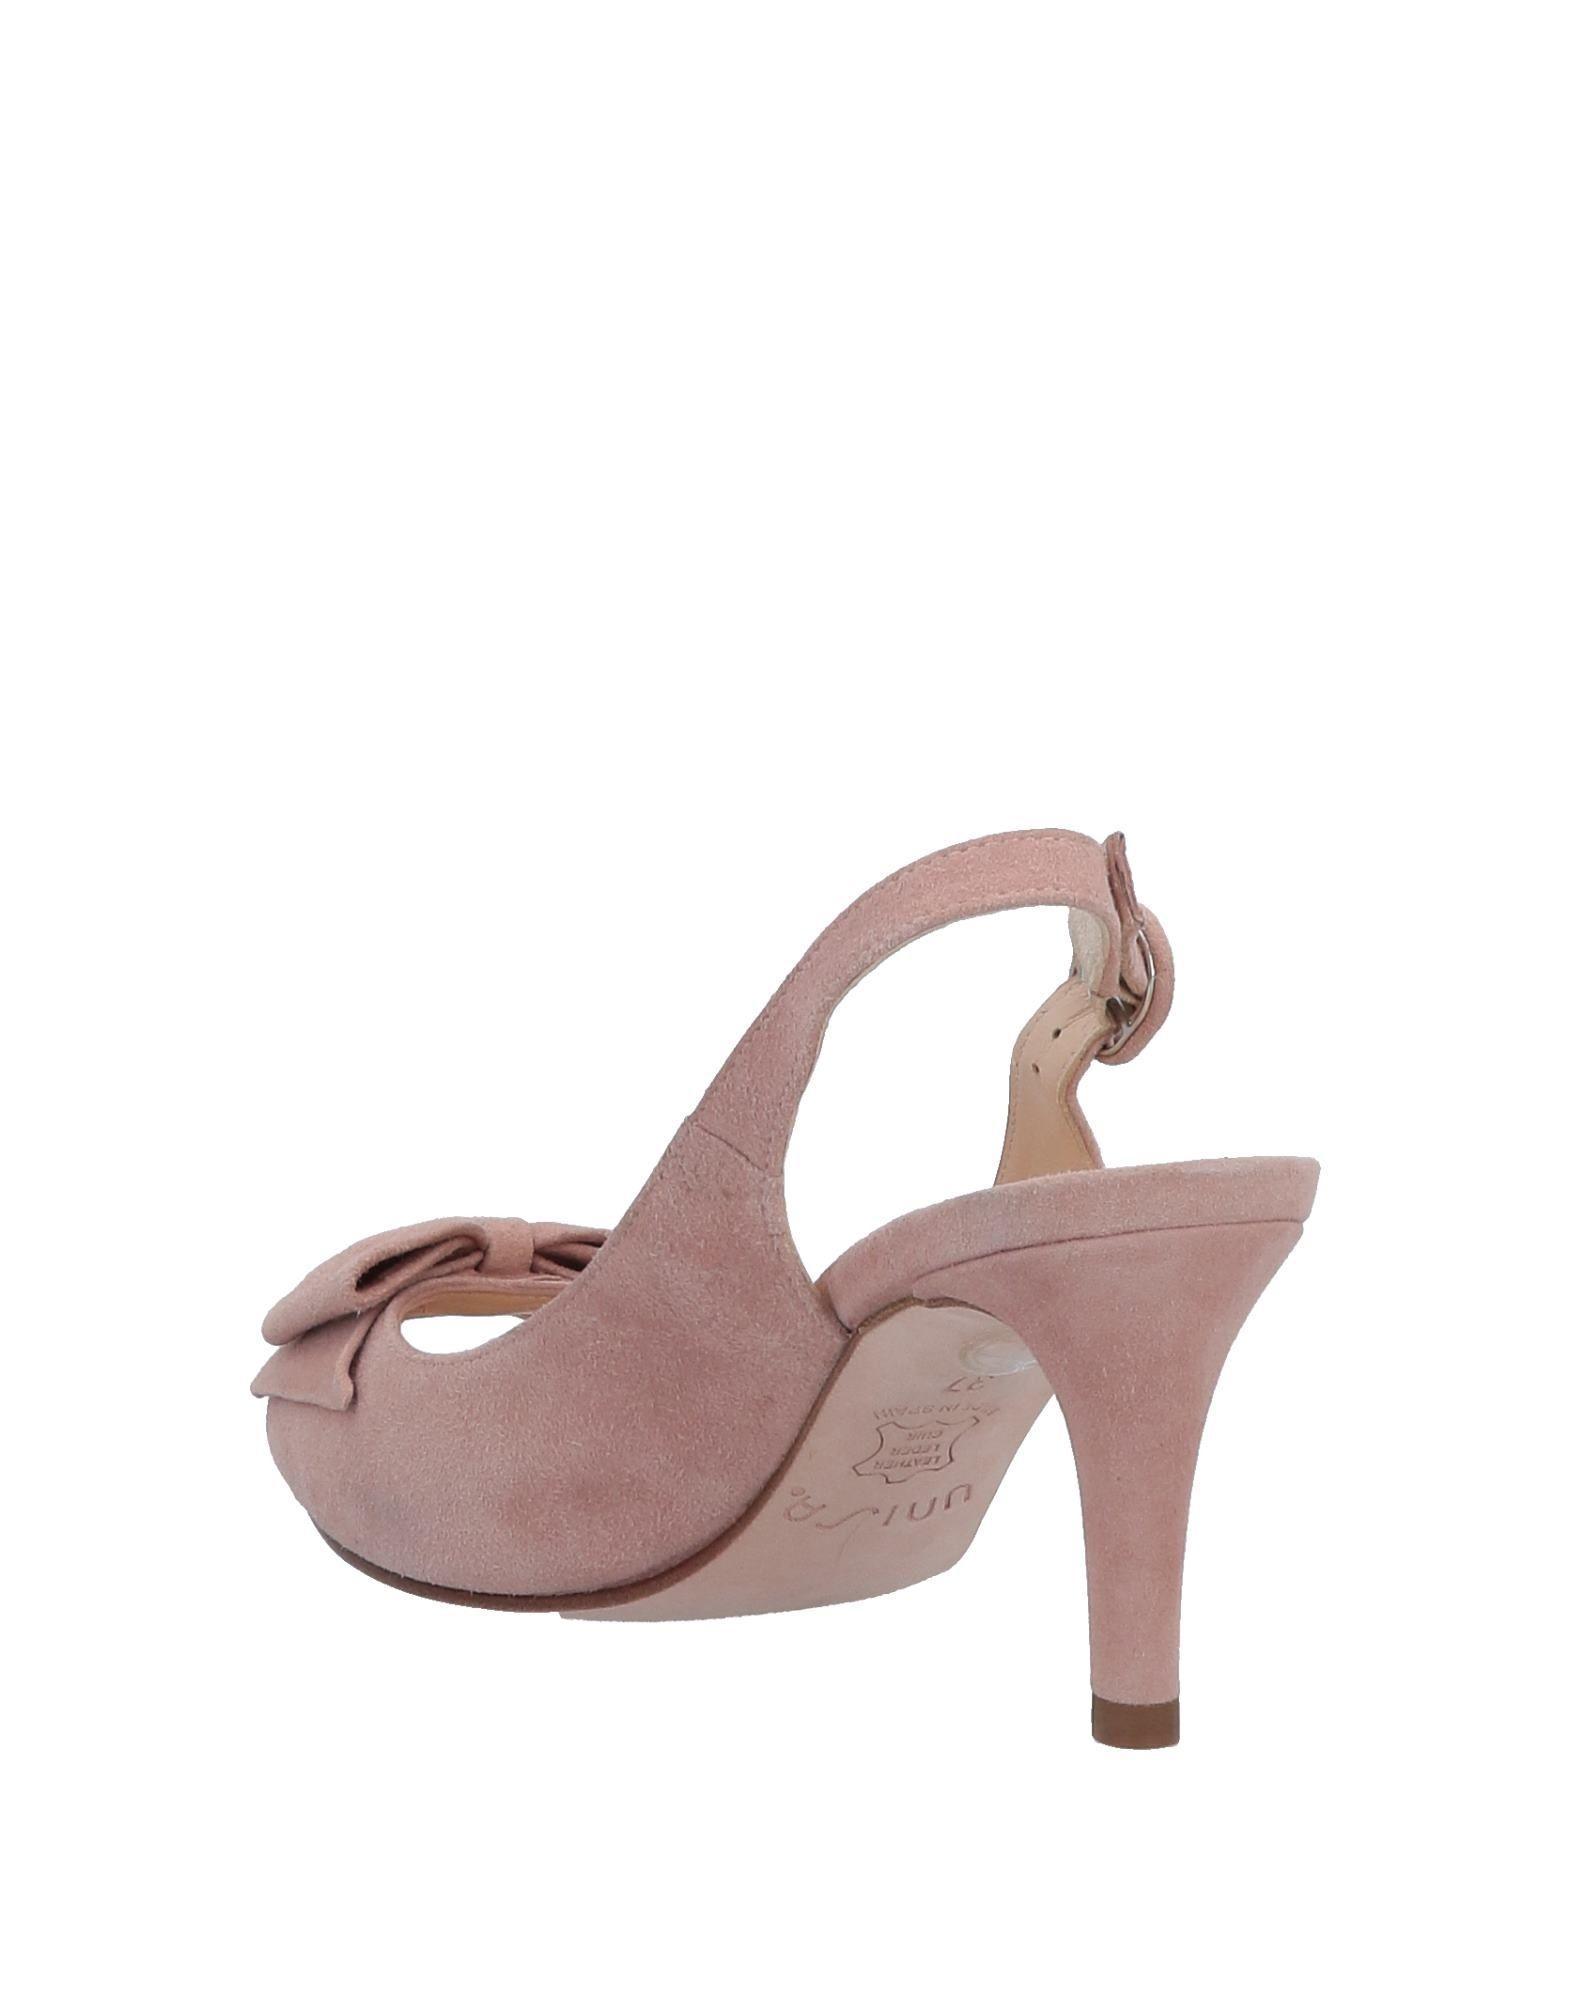 b2f619b81521 Lyst - Unisa Sandals in Pink